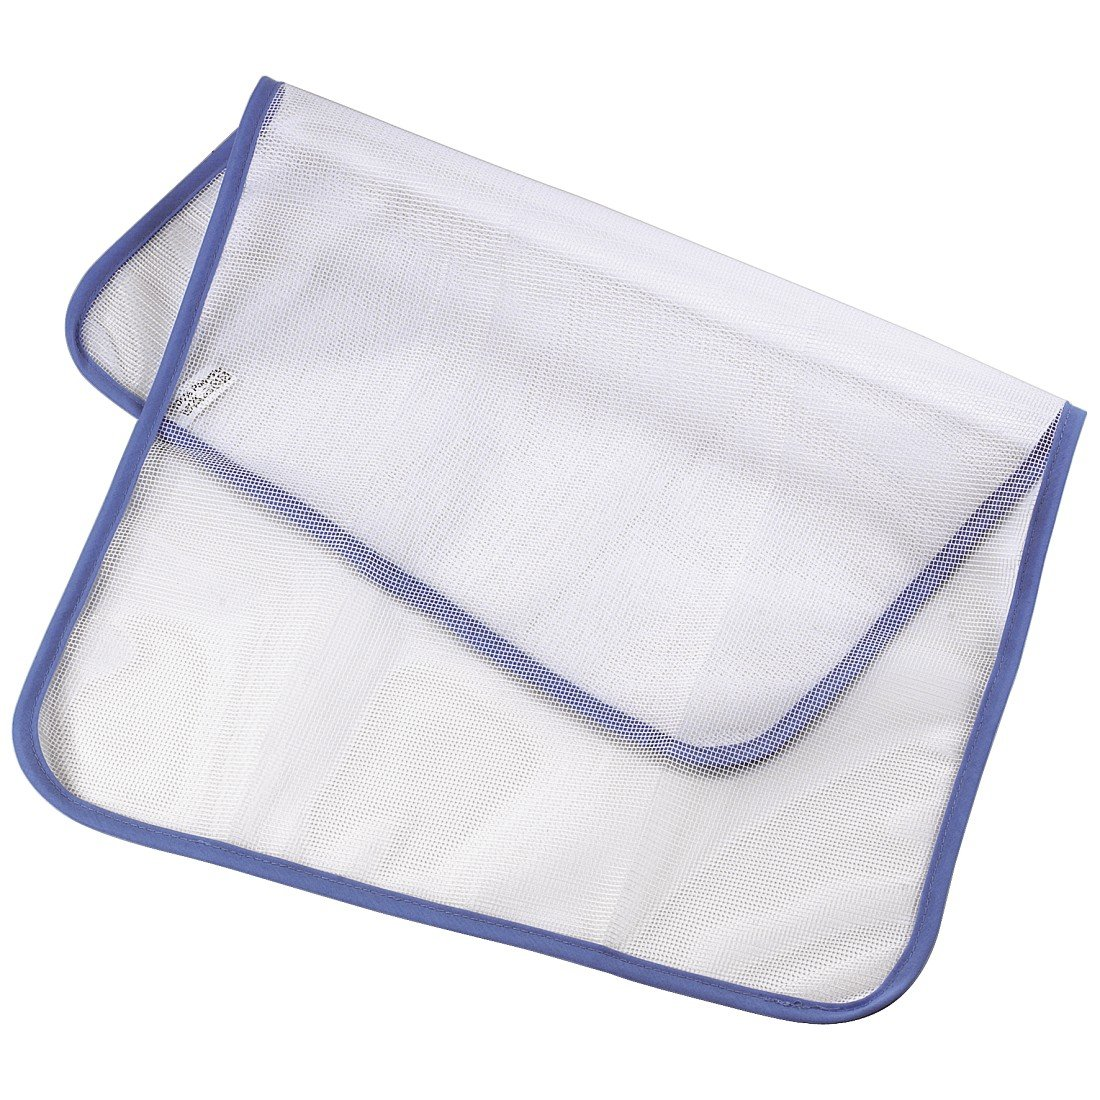 Xavax Tissu de protection pour le repassage, lot de 2 Hama 110941